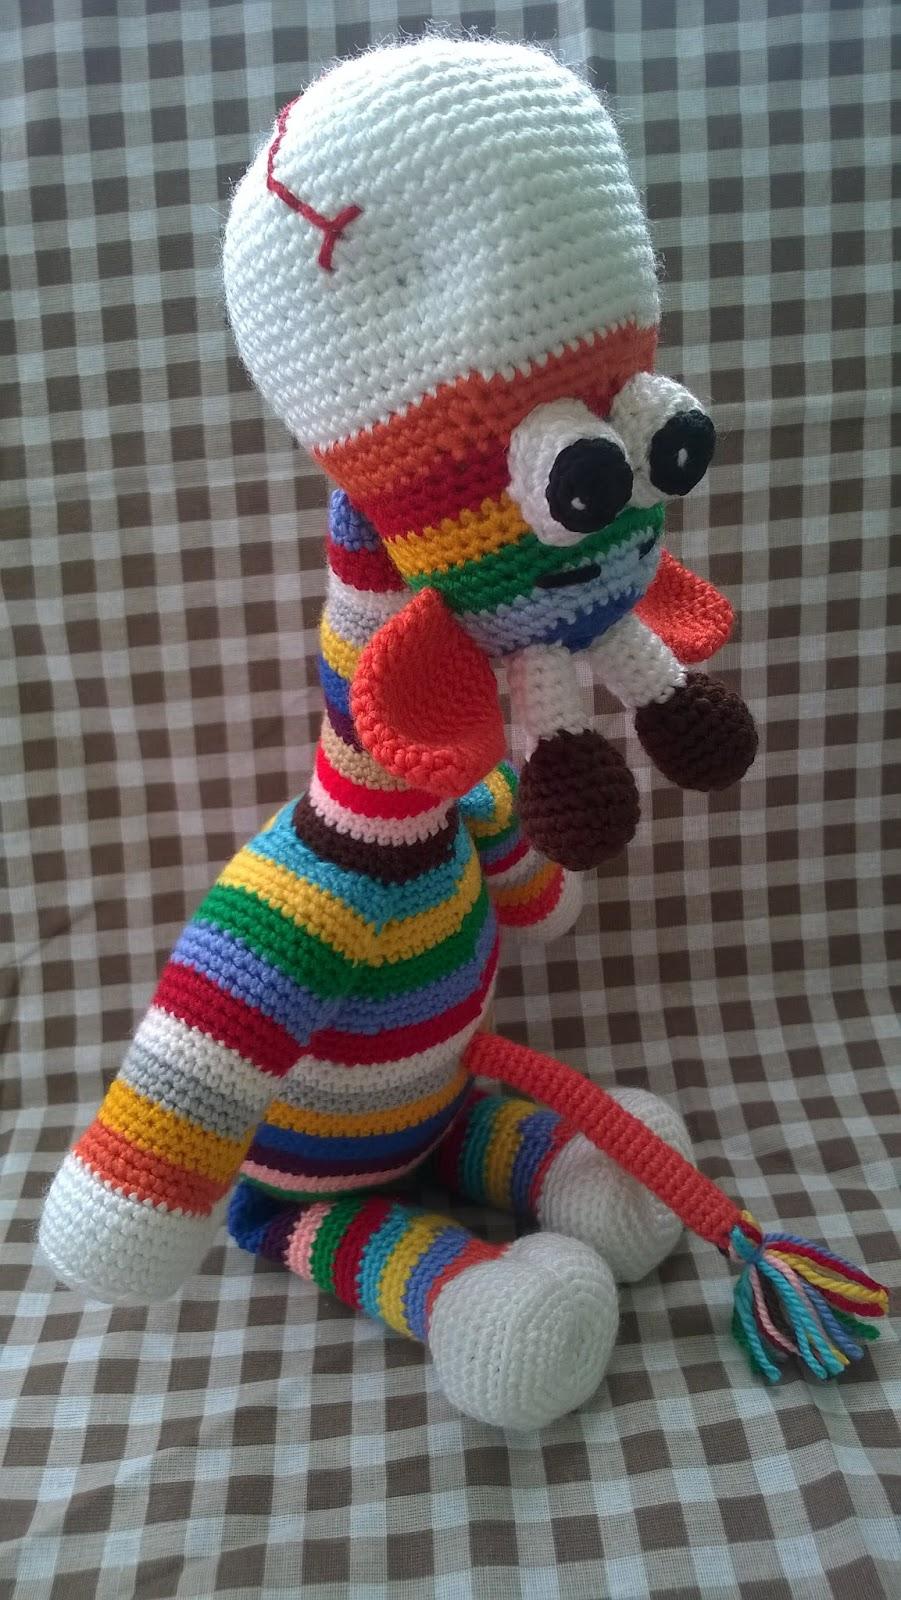 Amigurumi Zurafa : Orgu oyuncaklari (amigurumi toys): Nisan 2015